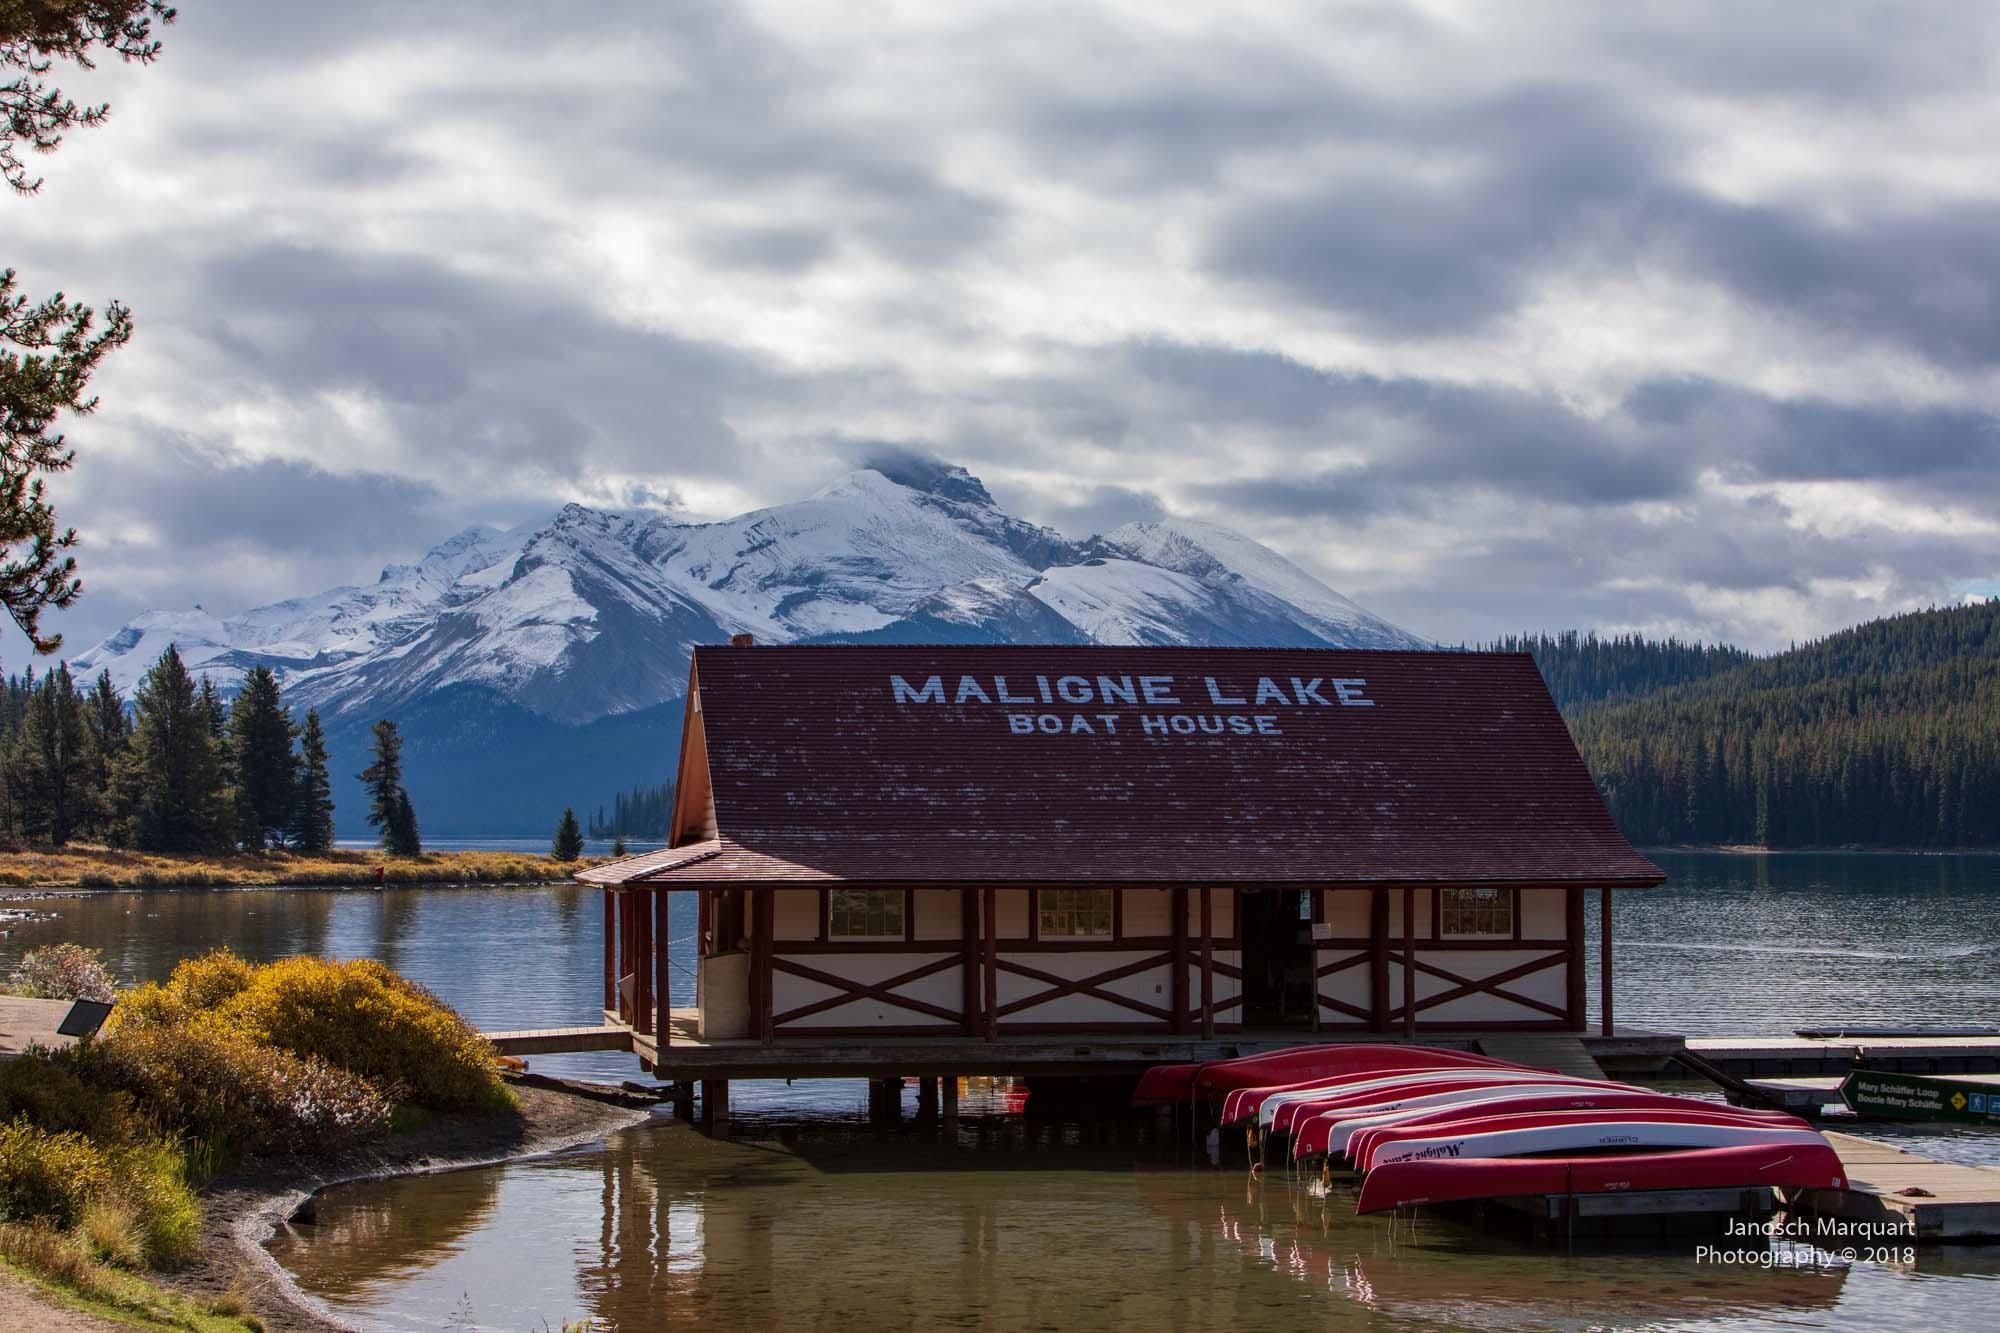 Foto des Bootshauses mit Kanus davor am Maligne Lake.